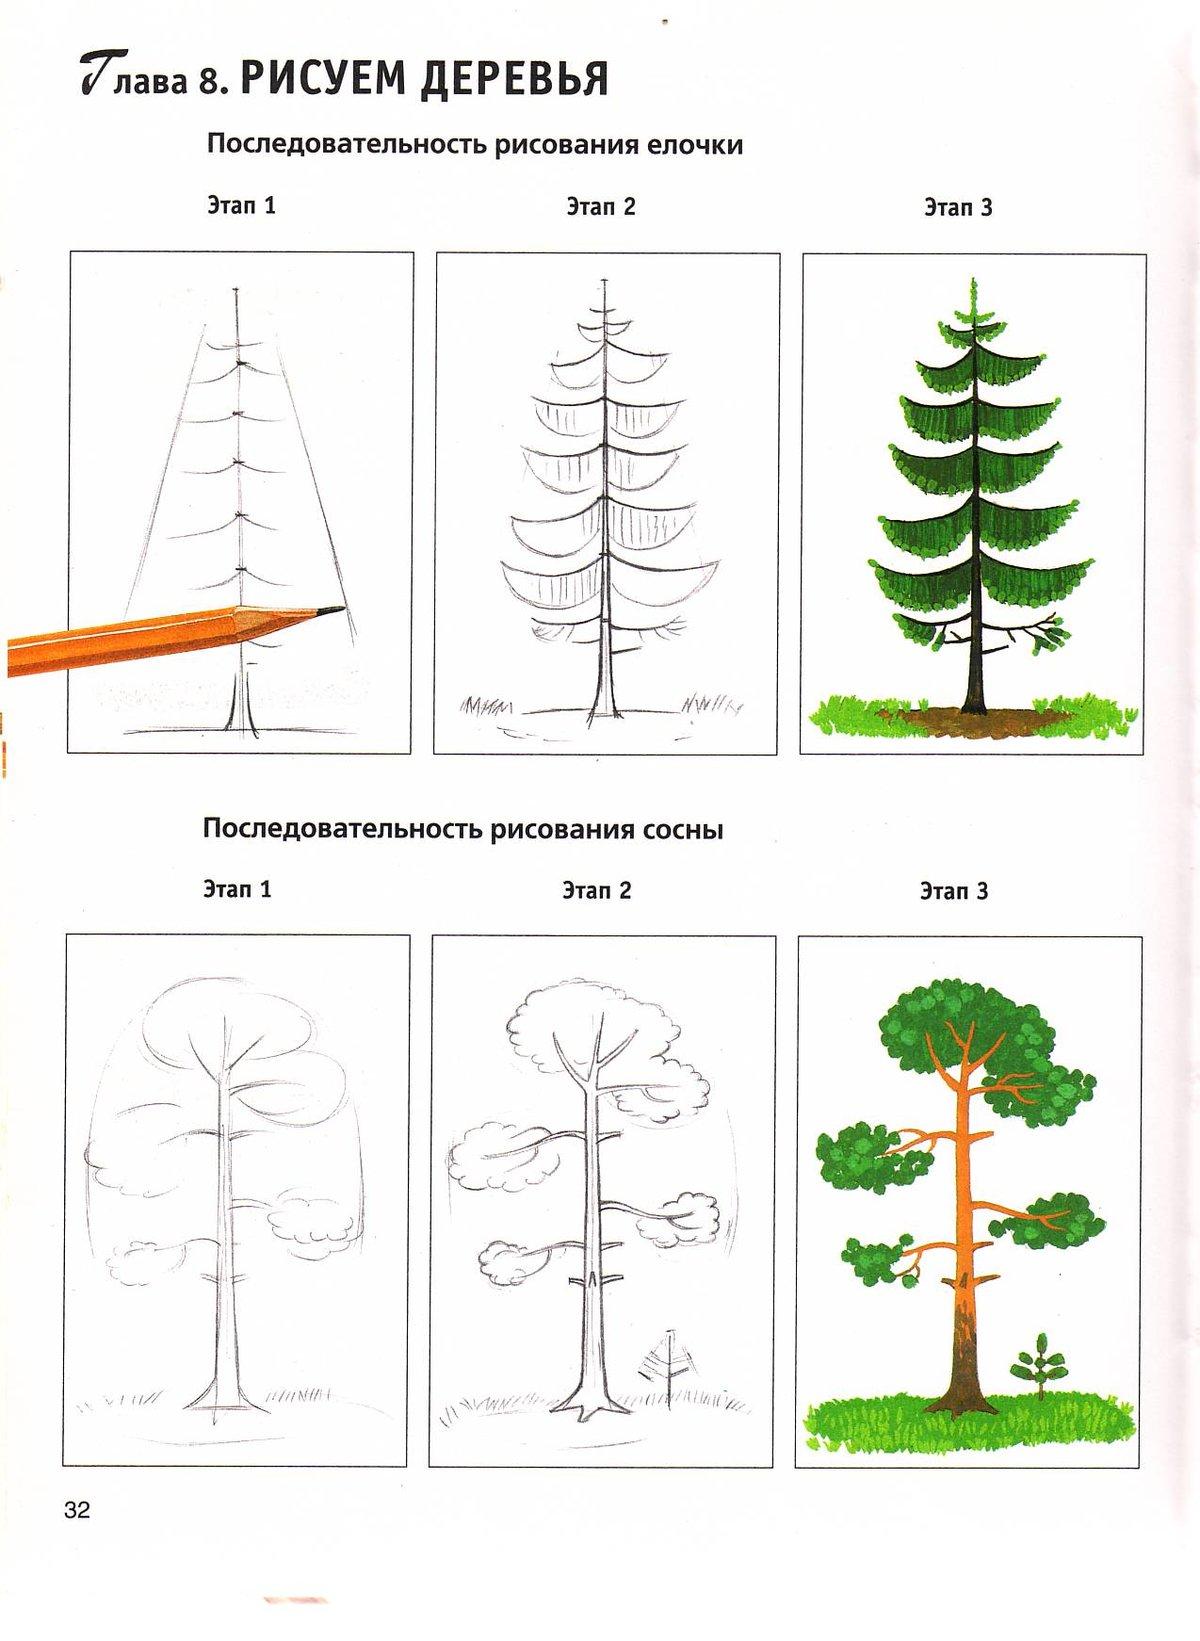 дерево картинки поэтапно для роли театре кино